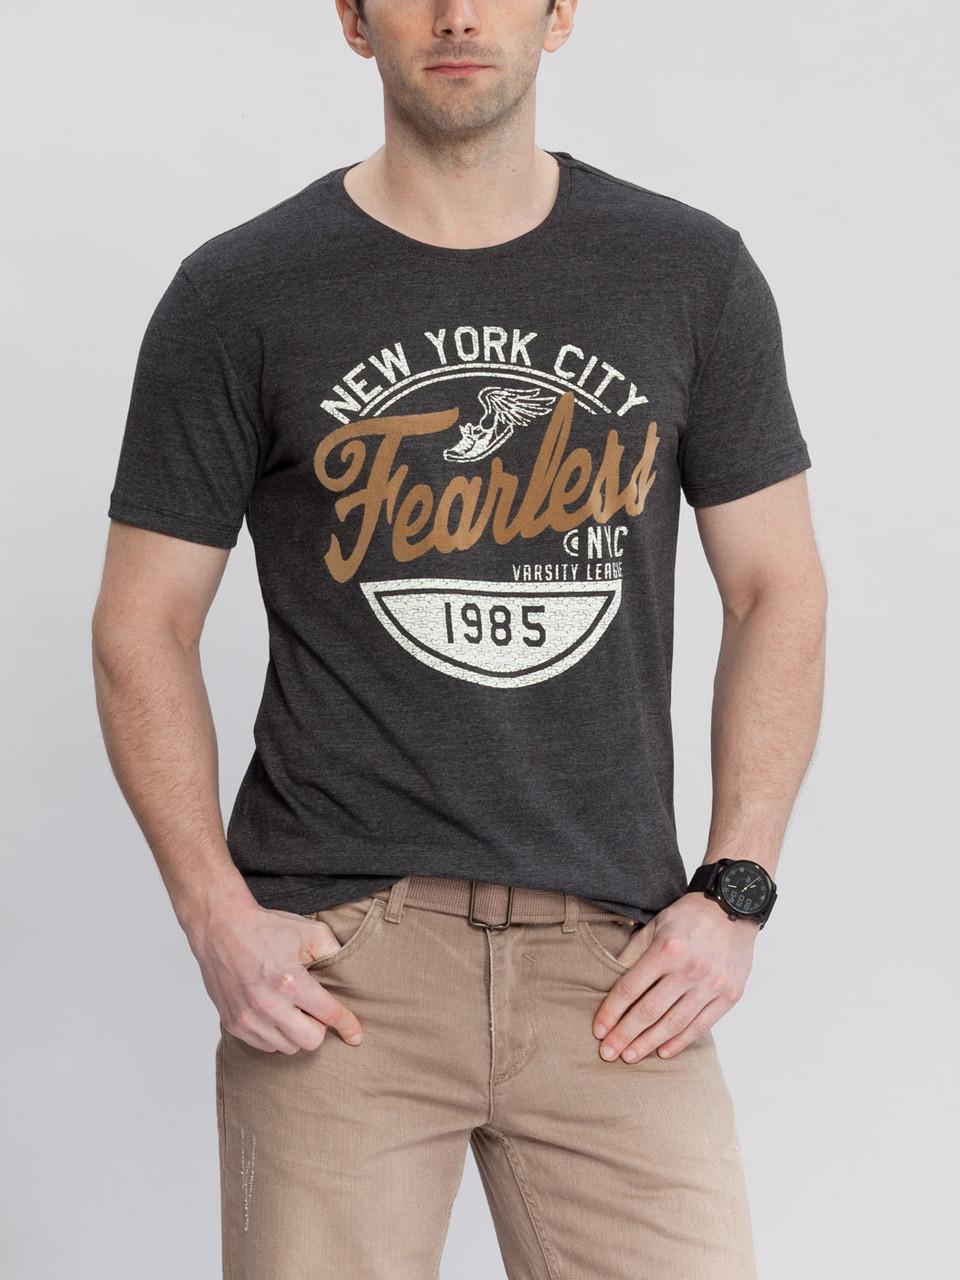 Серая мужская футболка LC Waikiki / ЛС Вайкики New York city